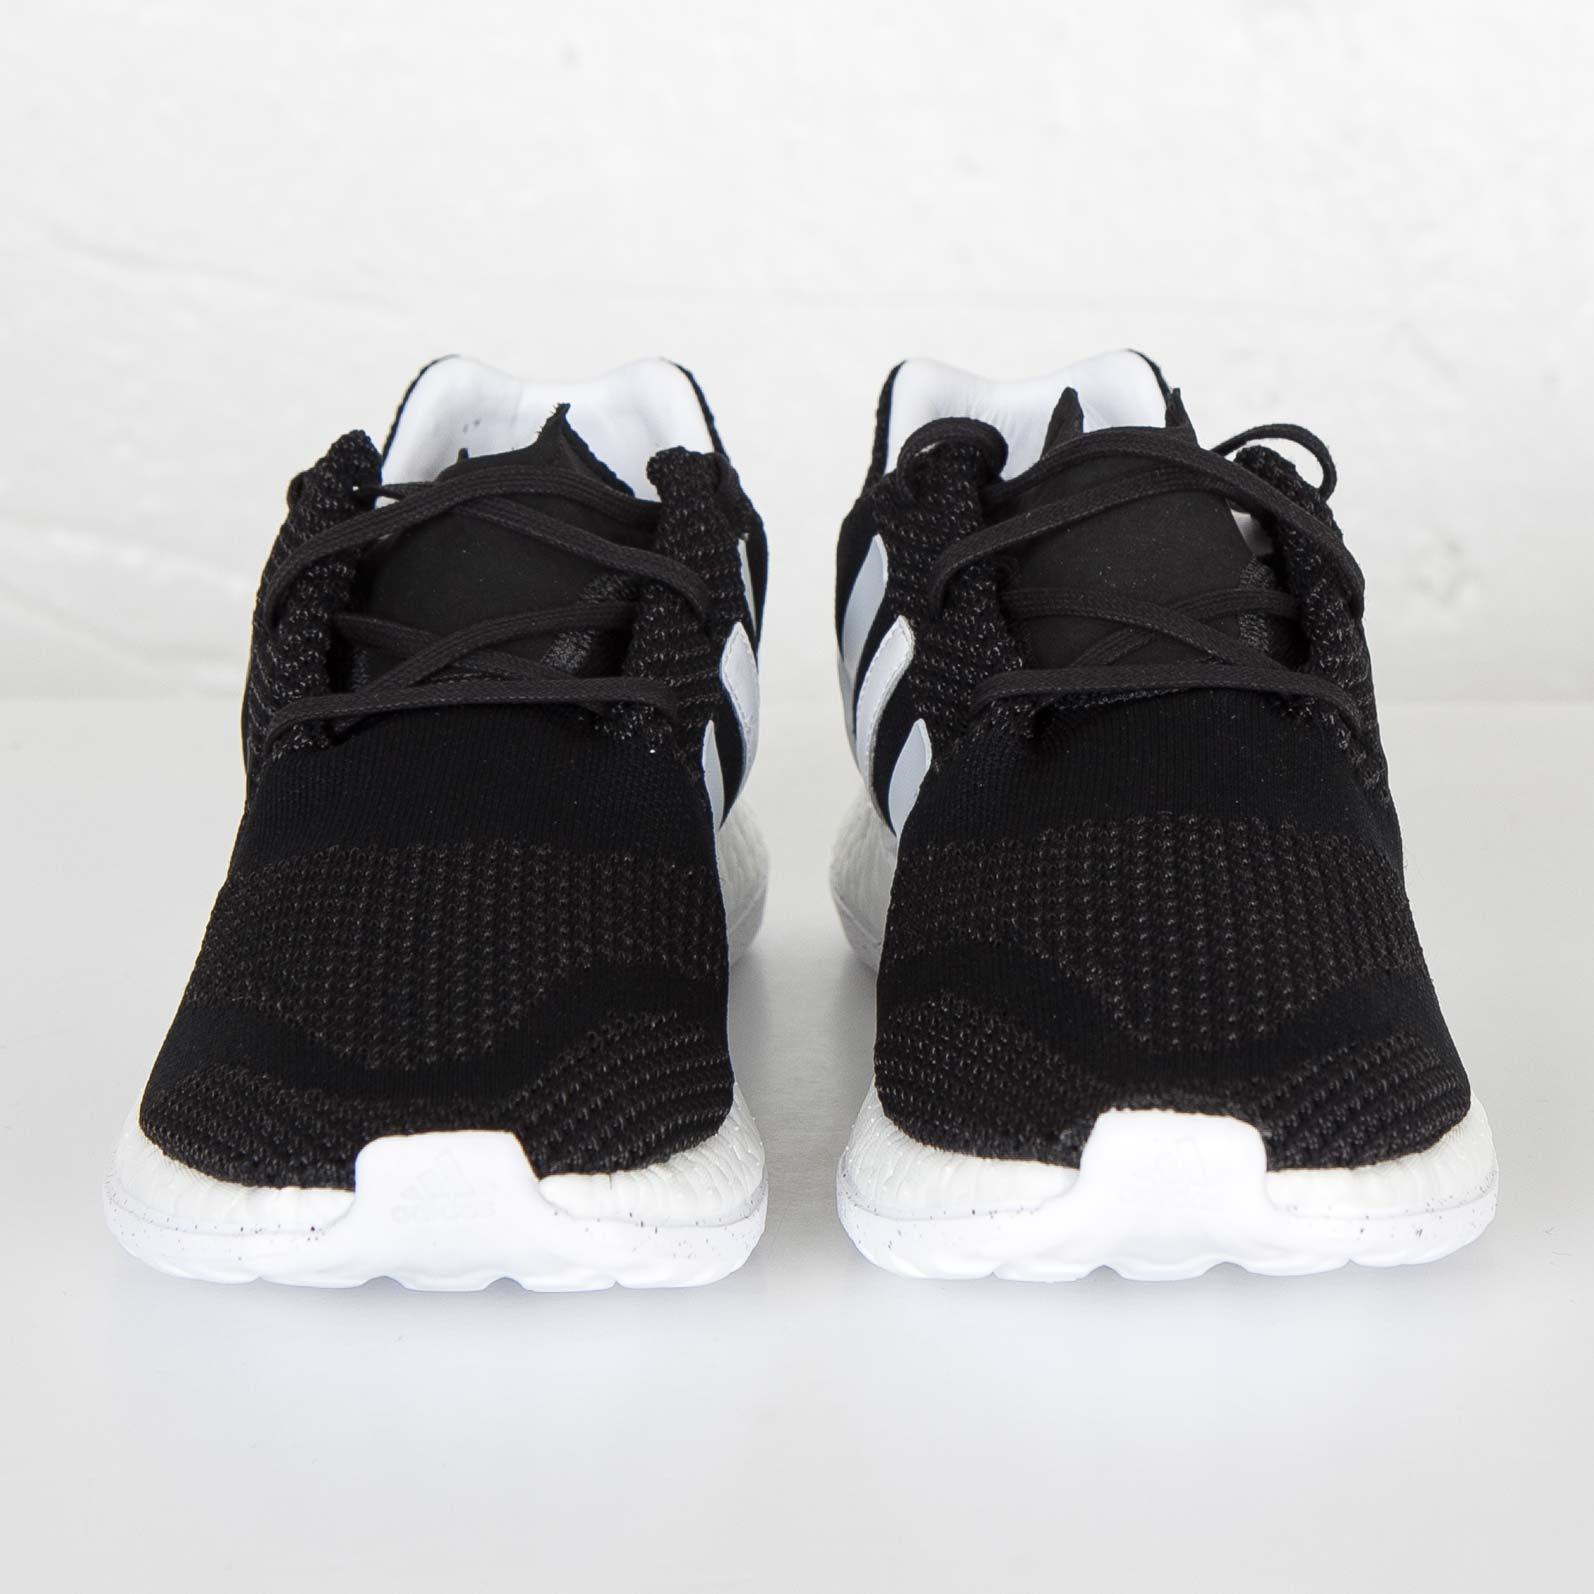 adidas Y-3 Pure Boost ZG Knit - Aq5729 - Sneakersnstuff  68ce42adb1